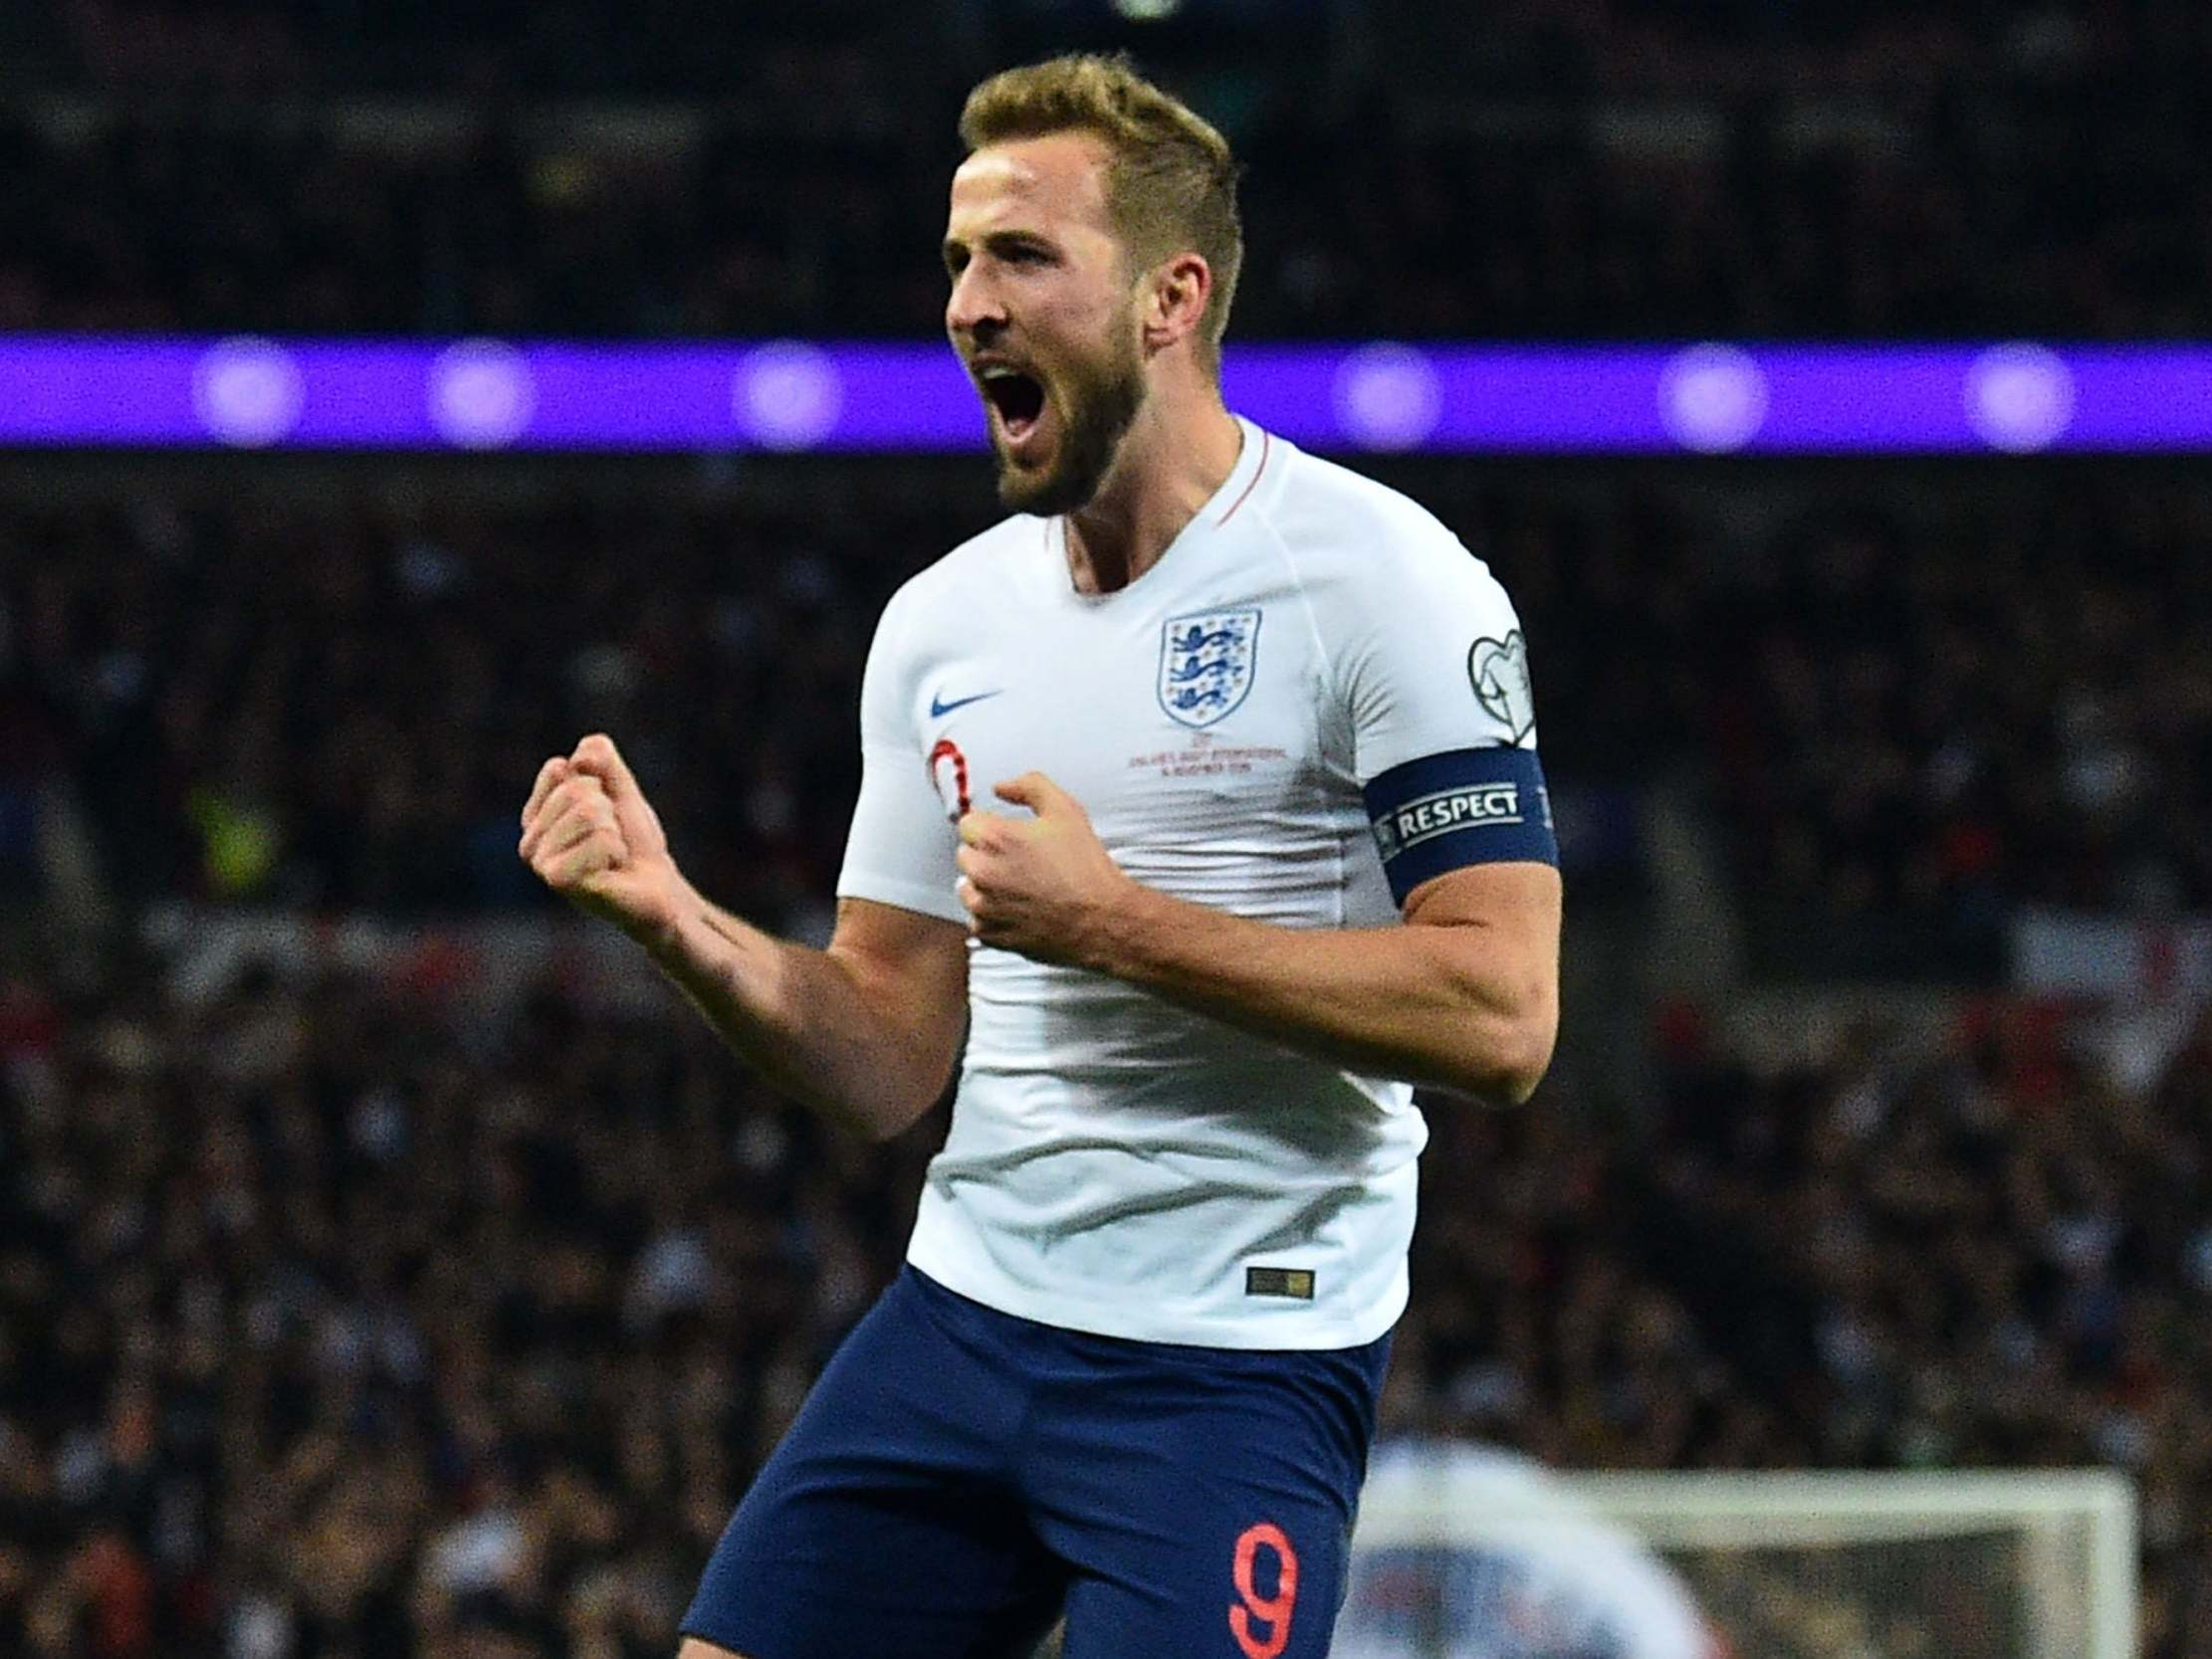 England vs Montenegro LIVE: Latest reaction after Gareth Southgate's side secure Euro 2020 spot